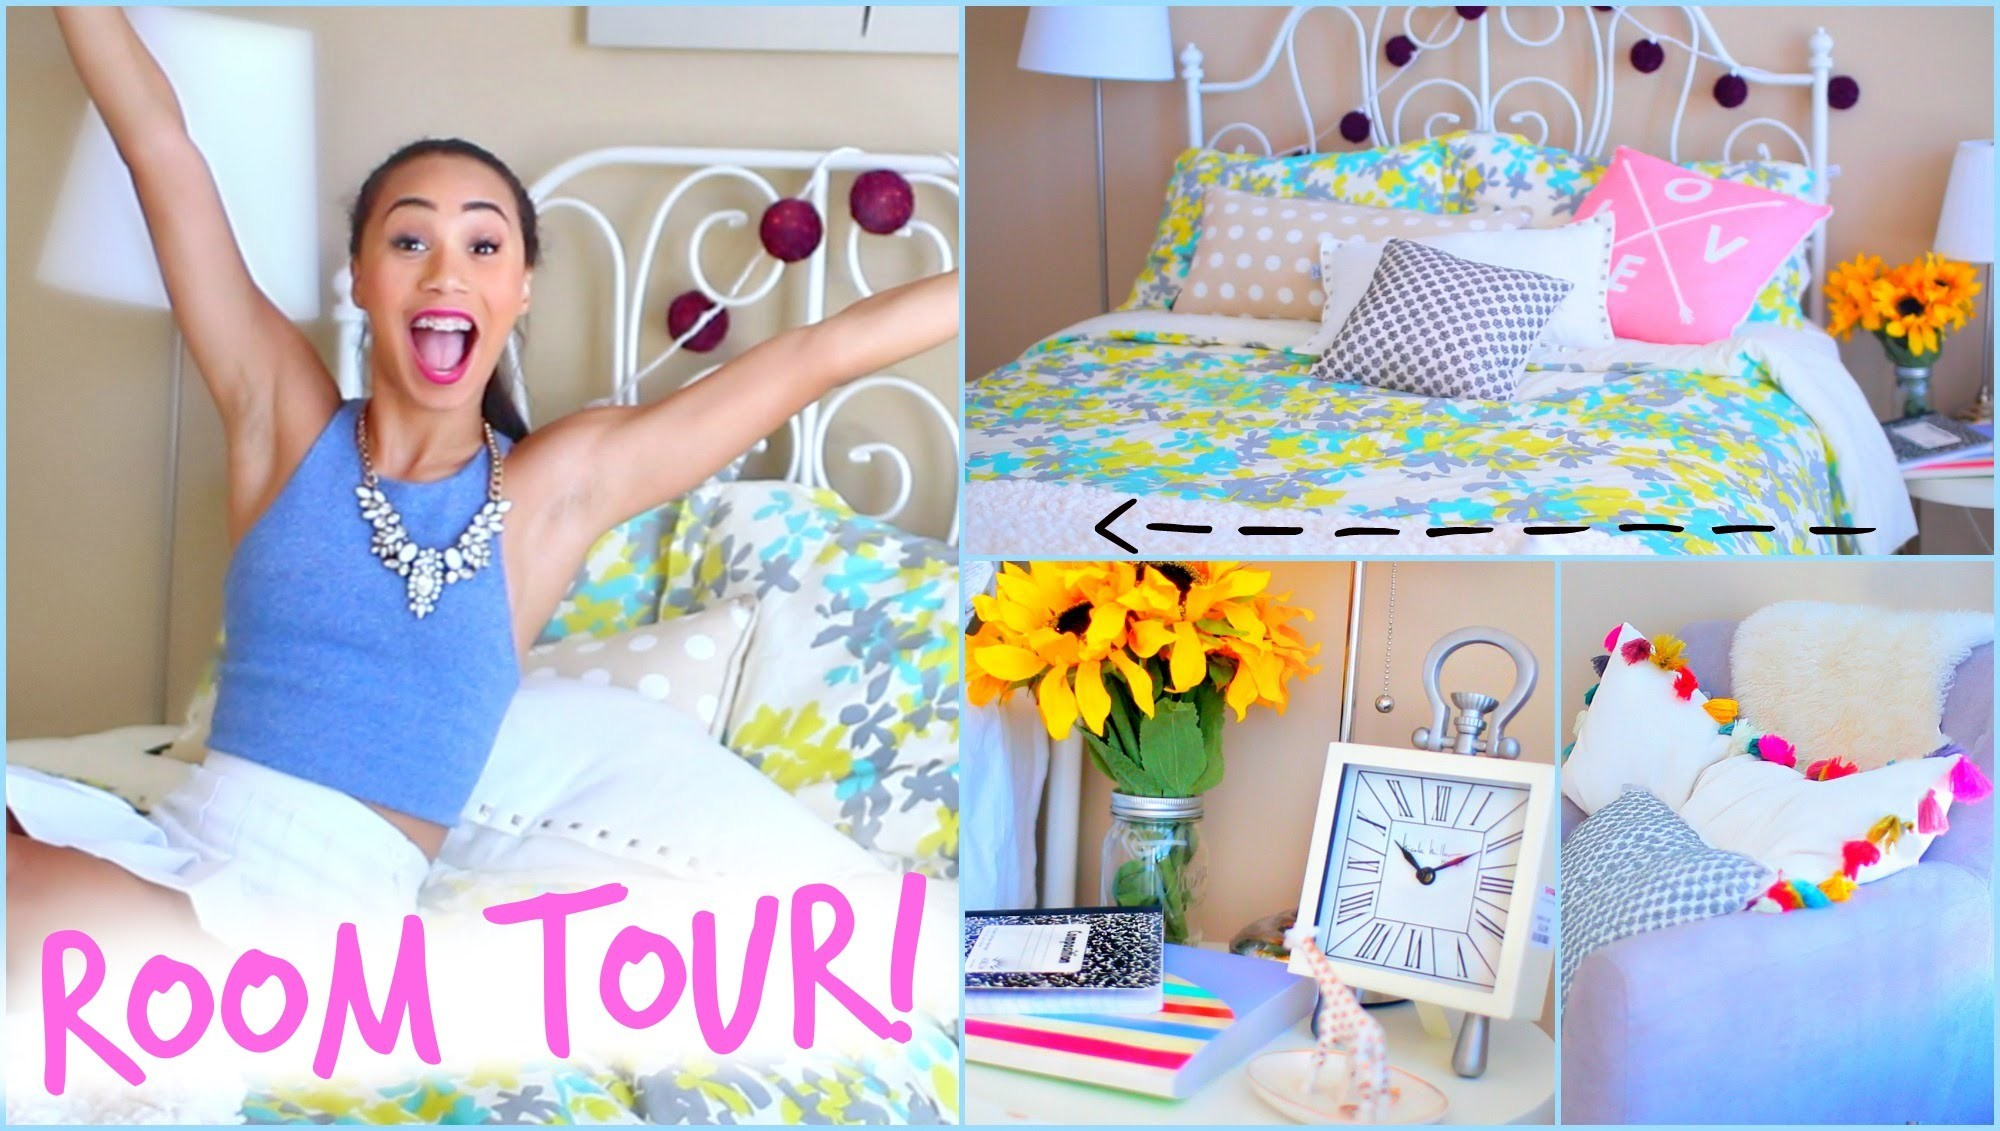 Room Tour 2014! ✿ Back To School Room Decor | Mylifeaseva